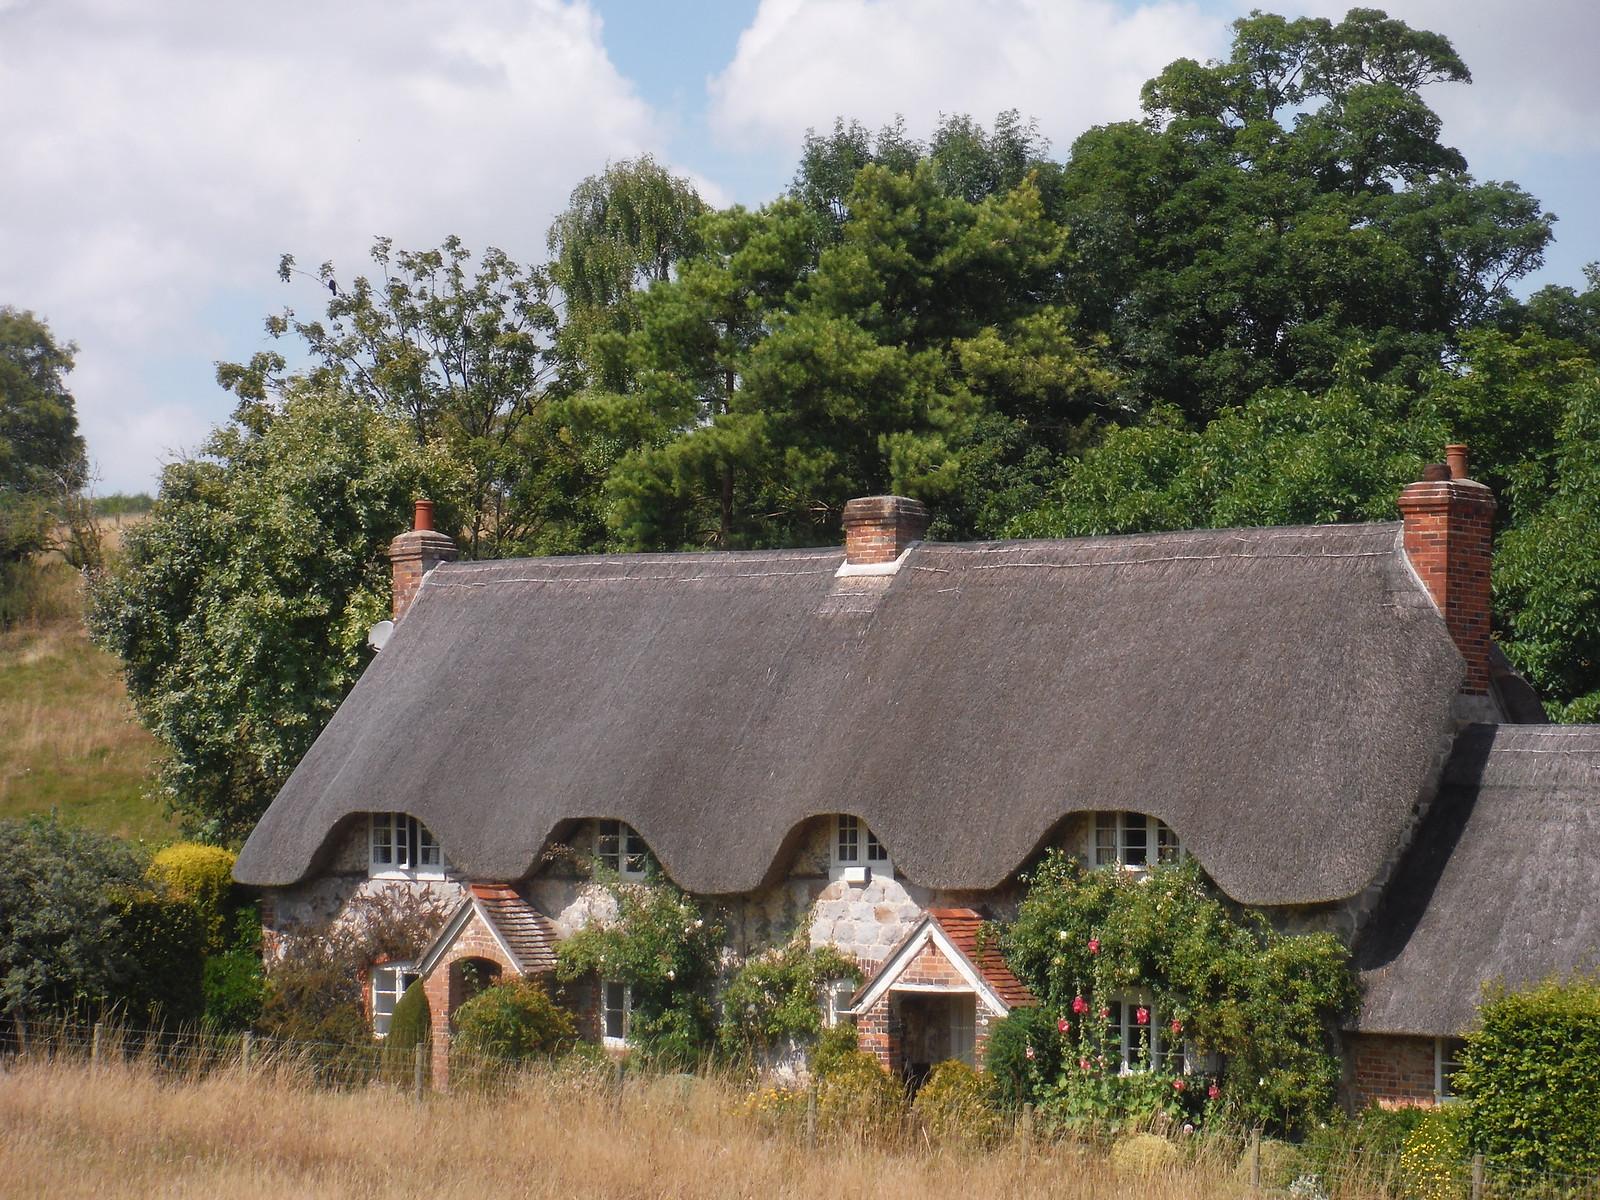 House in Lockeridge SWC Walk 255 Pewsey or Marlborough Circular via Avebury